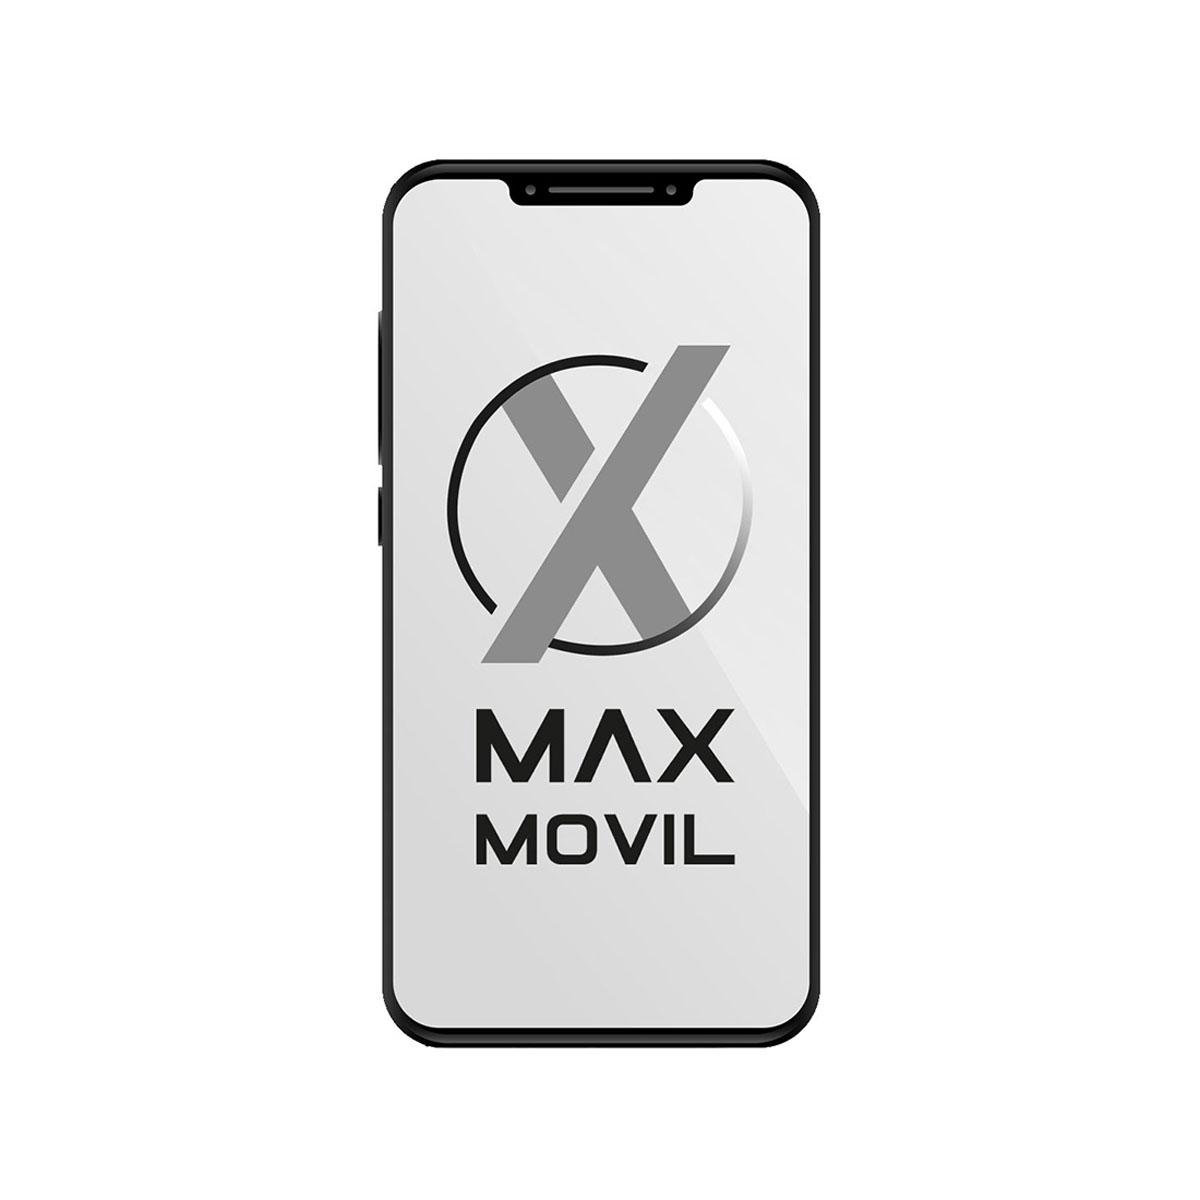 Kit accesorios para Samsung Galaxy S8 EP-WG95BBB